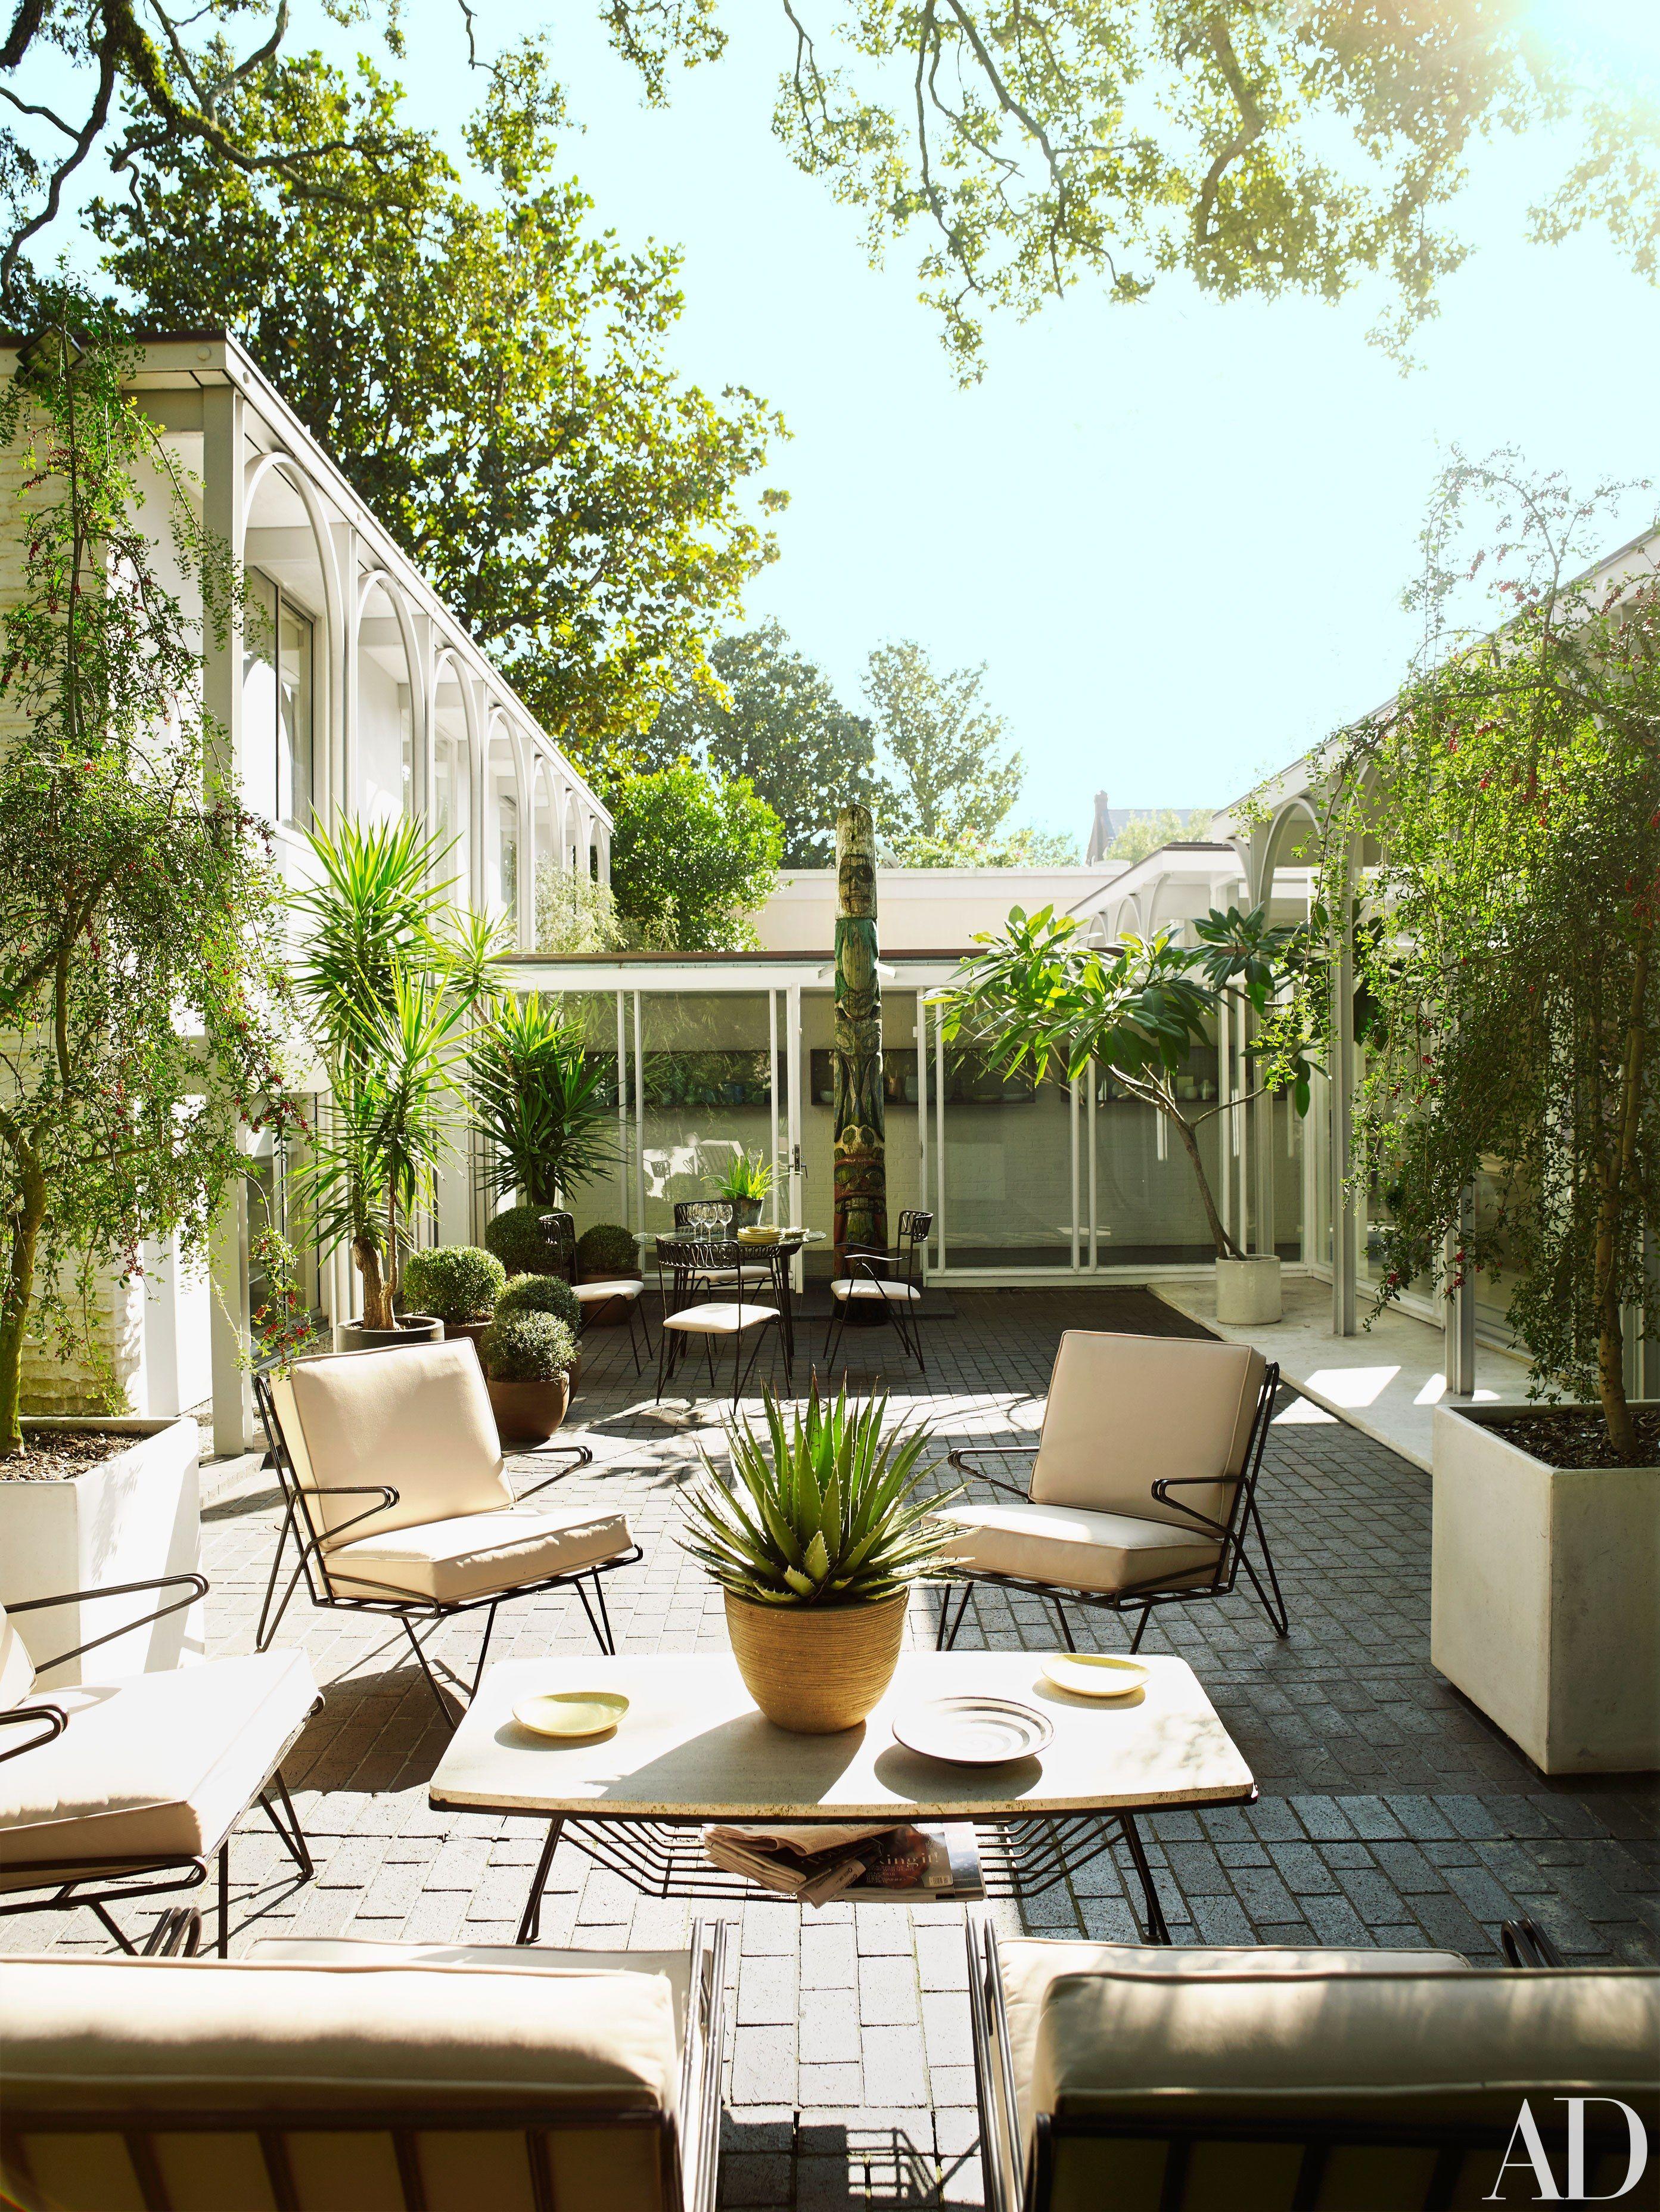 We Visit Architect Lee Ledbetter s Modern New Orleans House